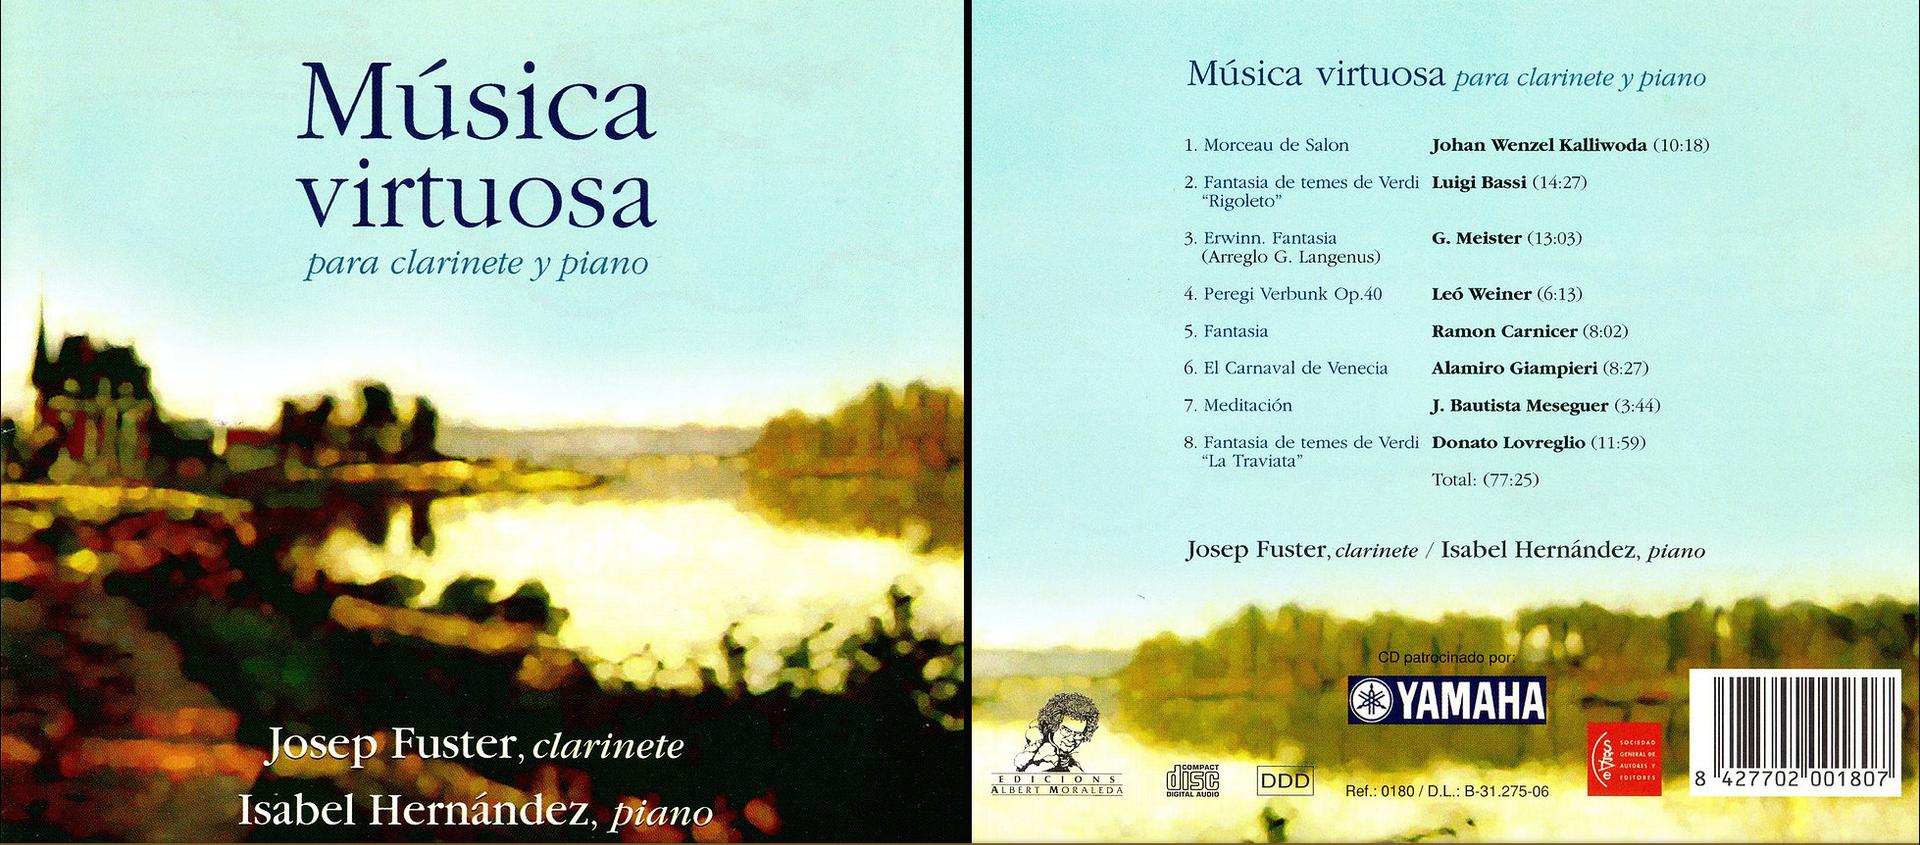 Musica virtuosa 1.png